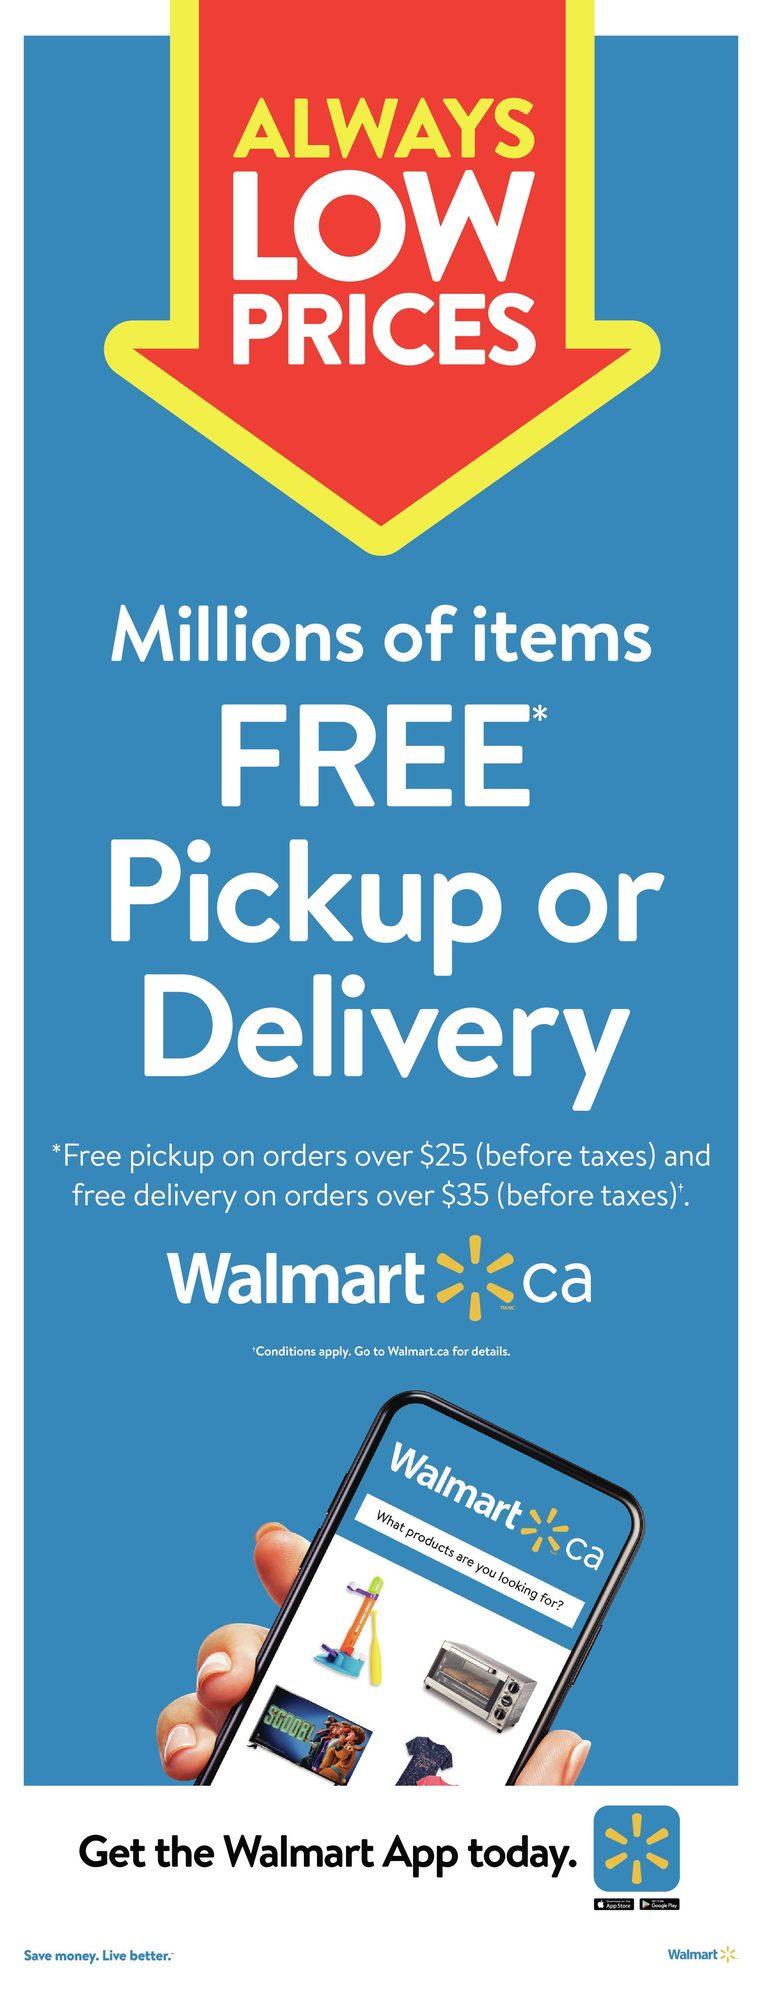 Walmart - Weekly Flyer Specials - Page 13